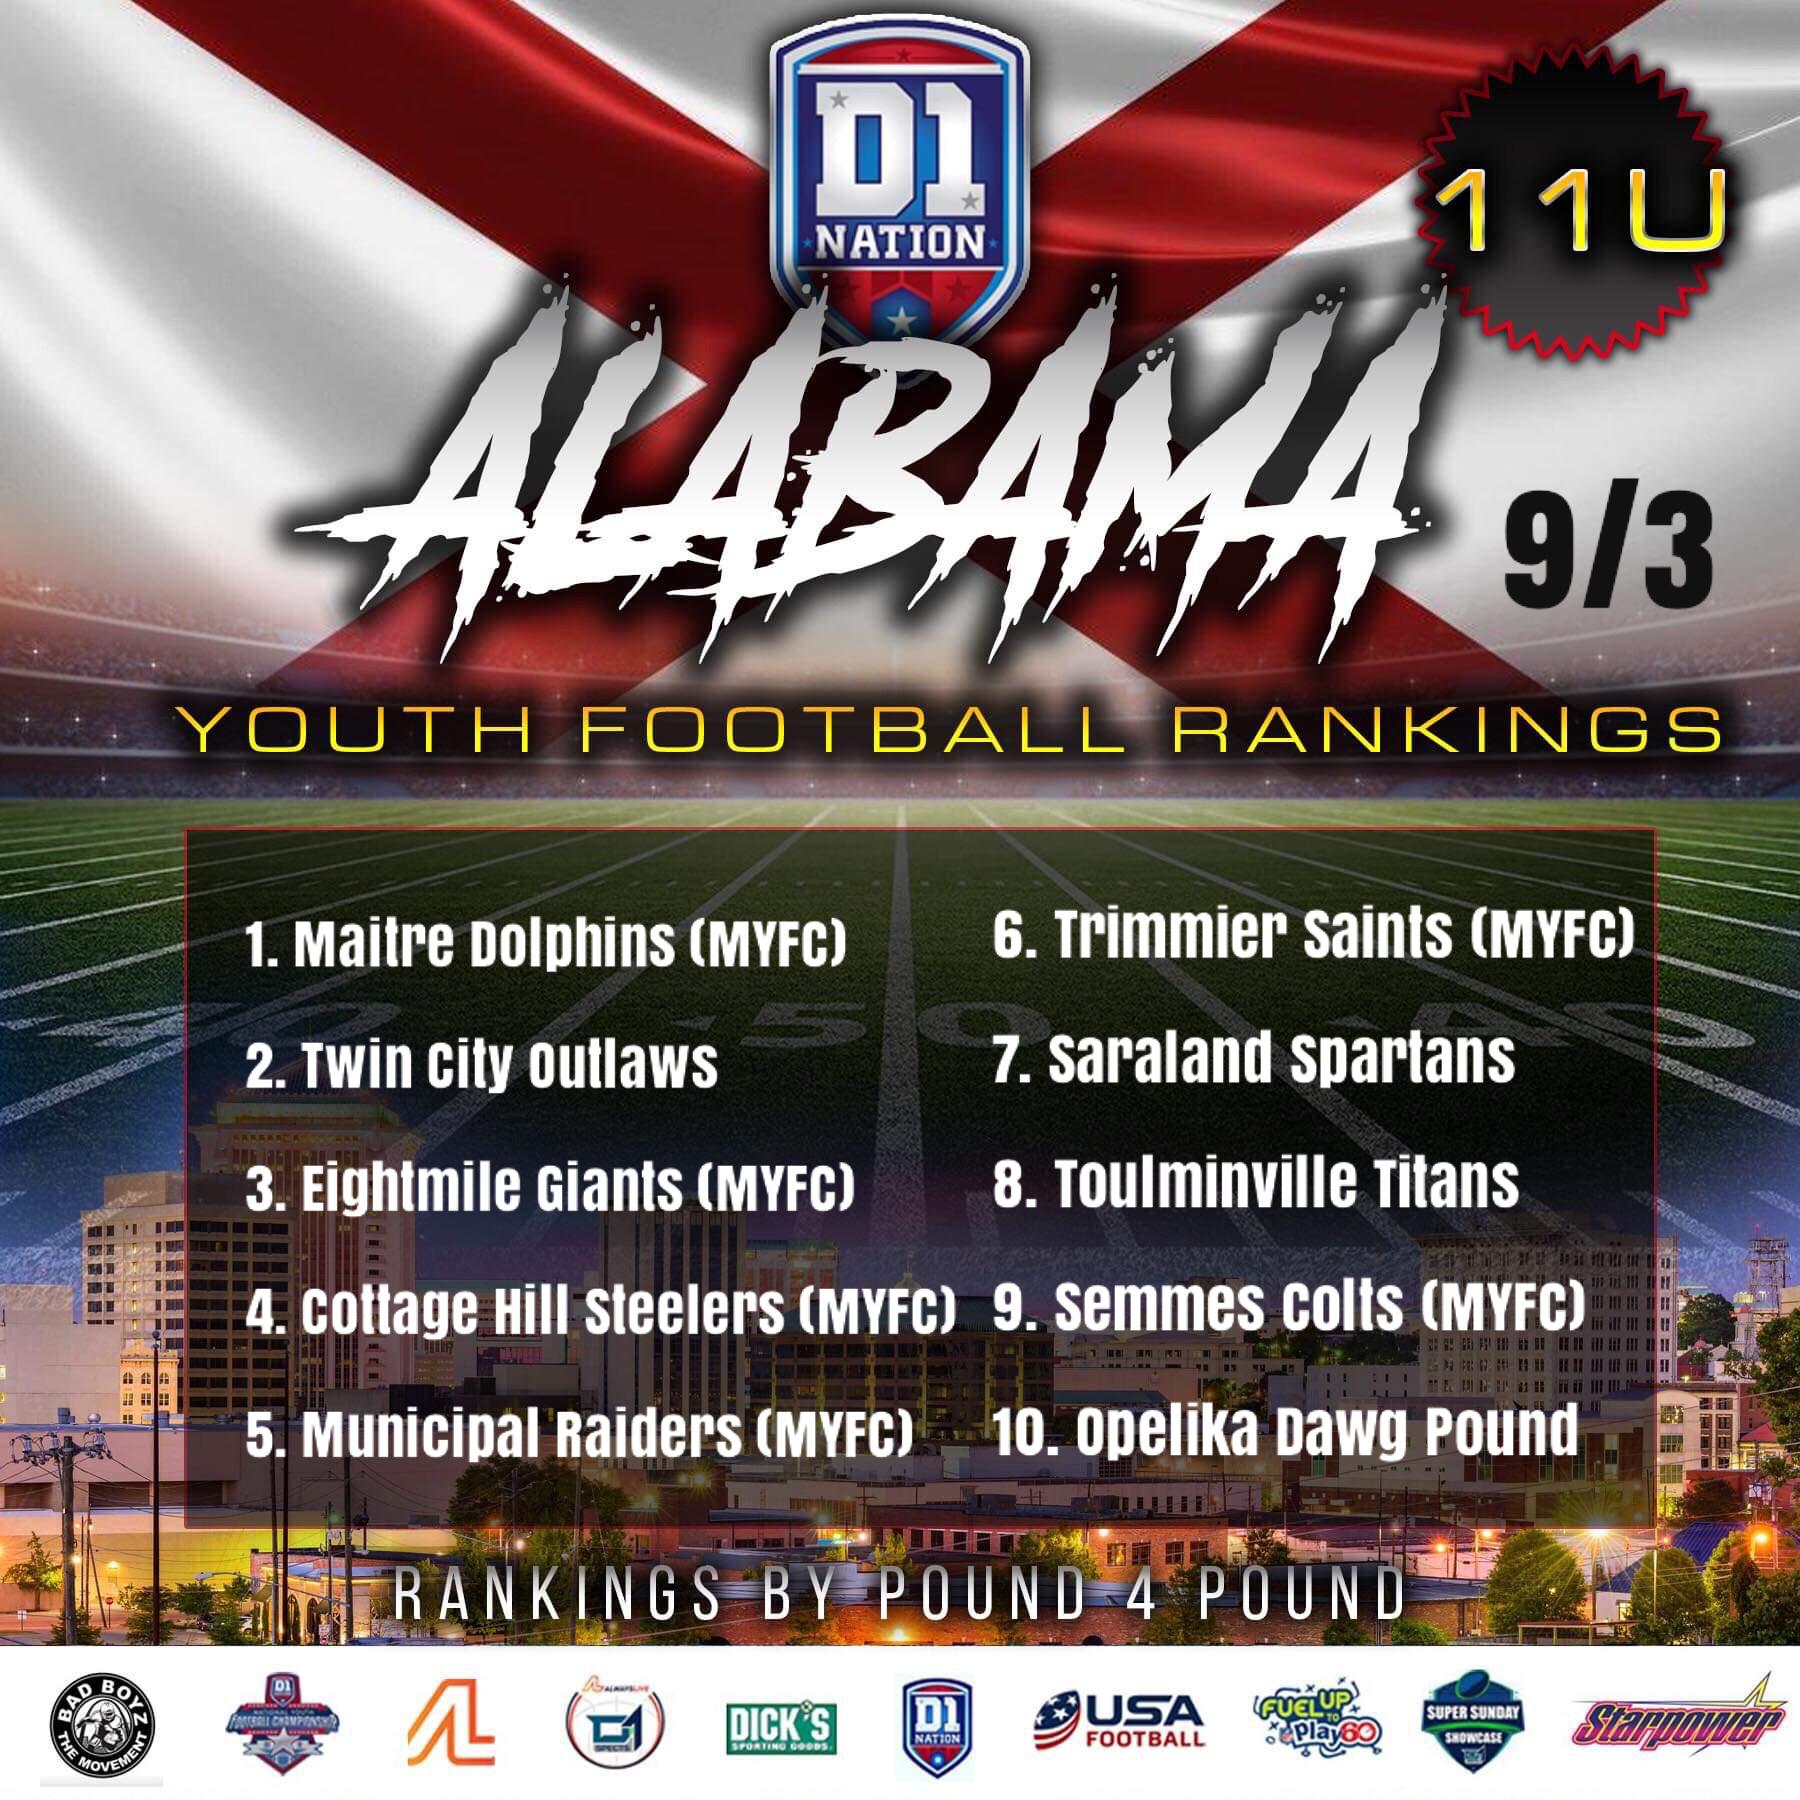 UPDATE 9/3/2019: Alabama Youth Football Rankings – 11U